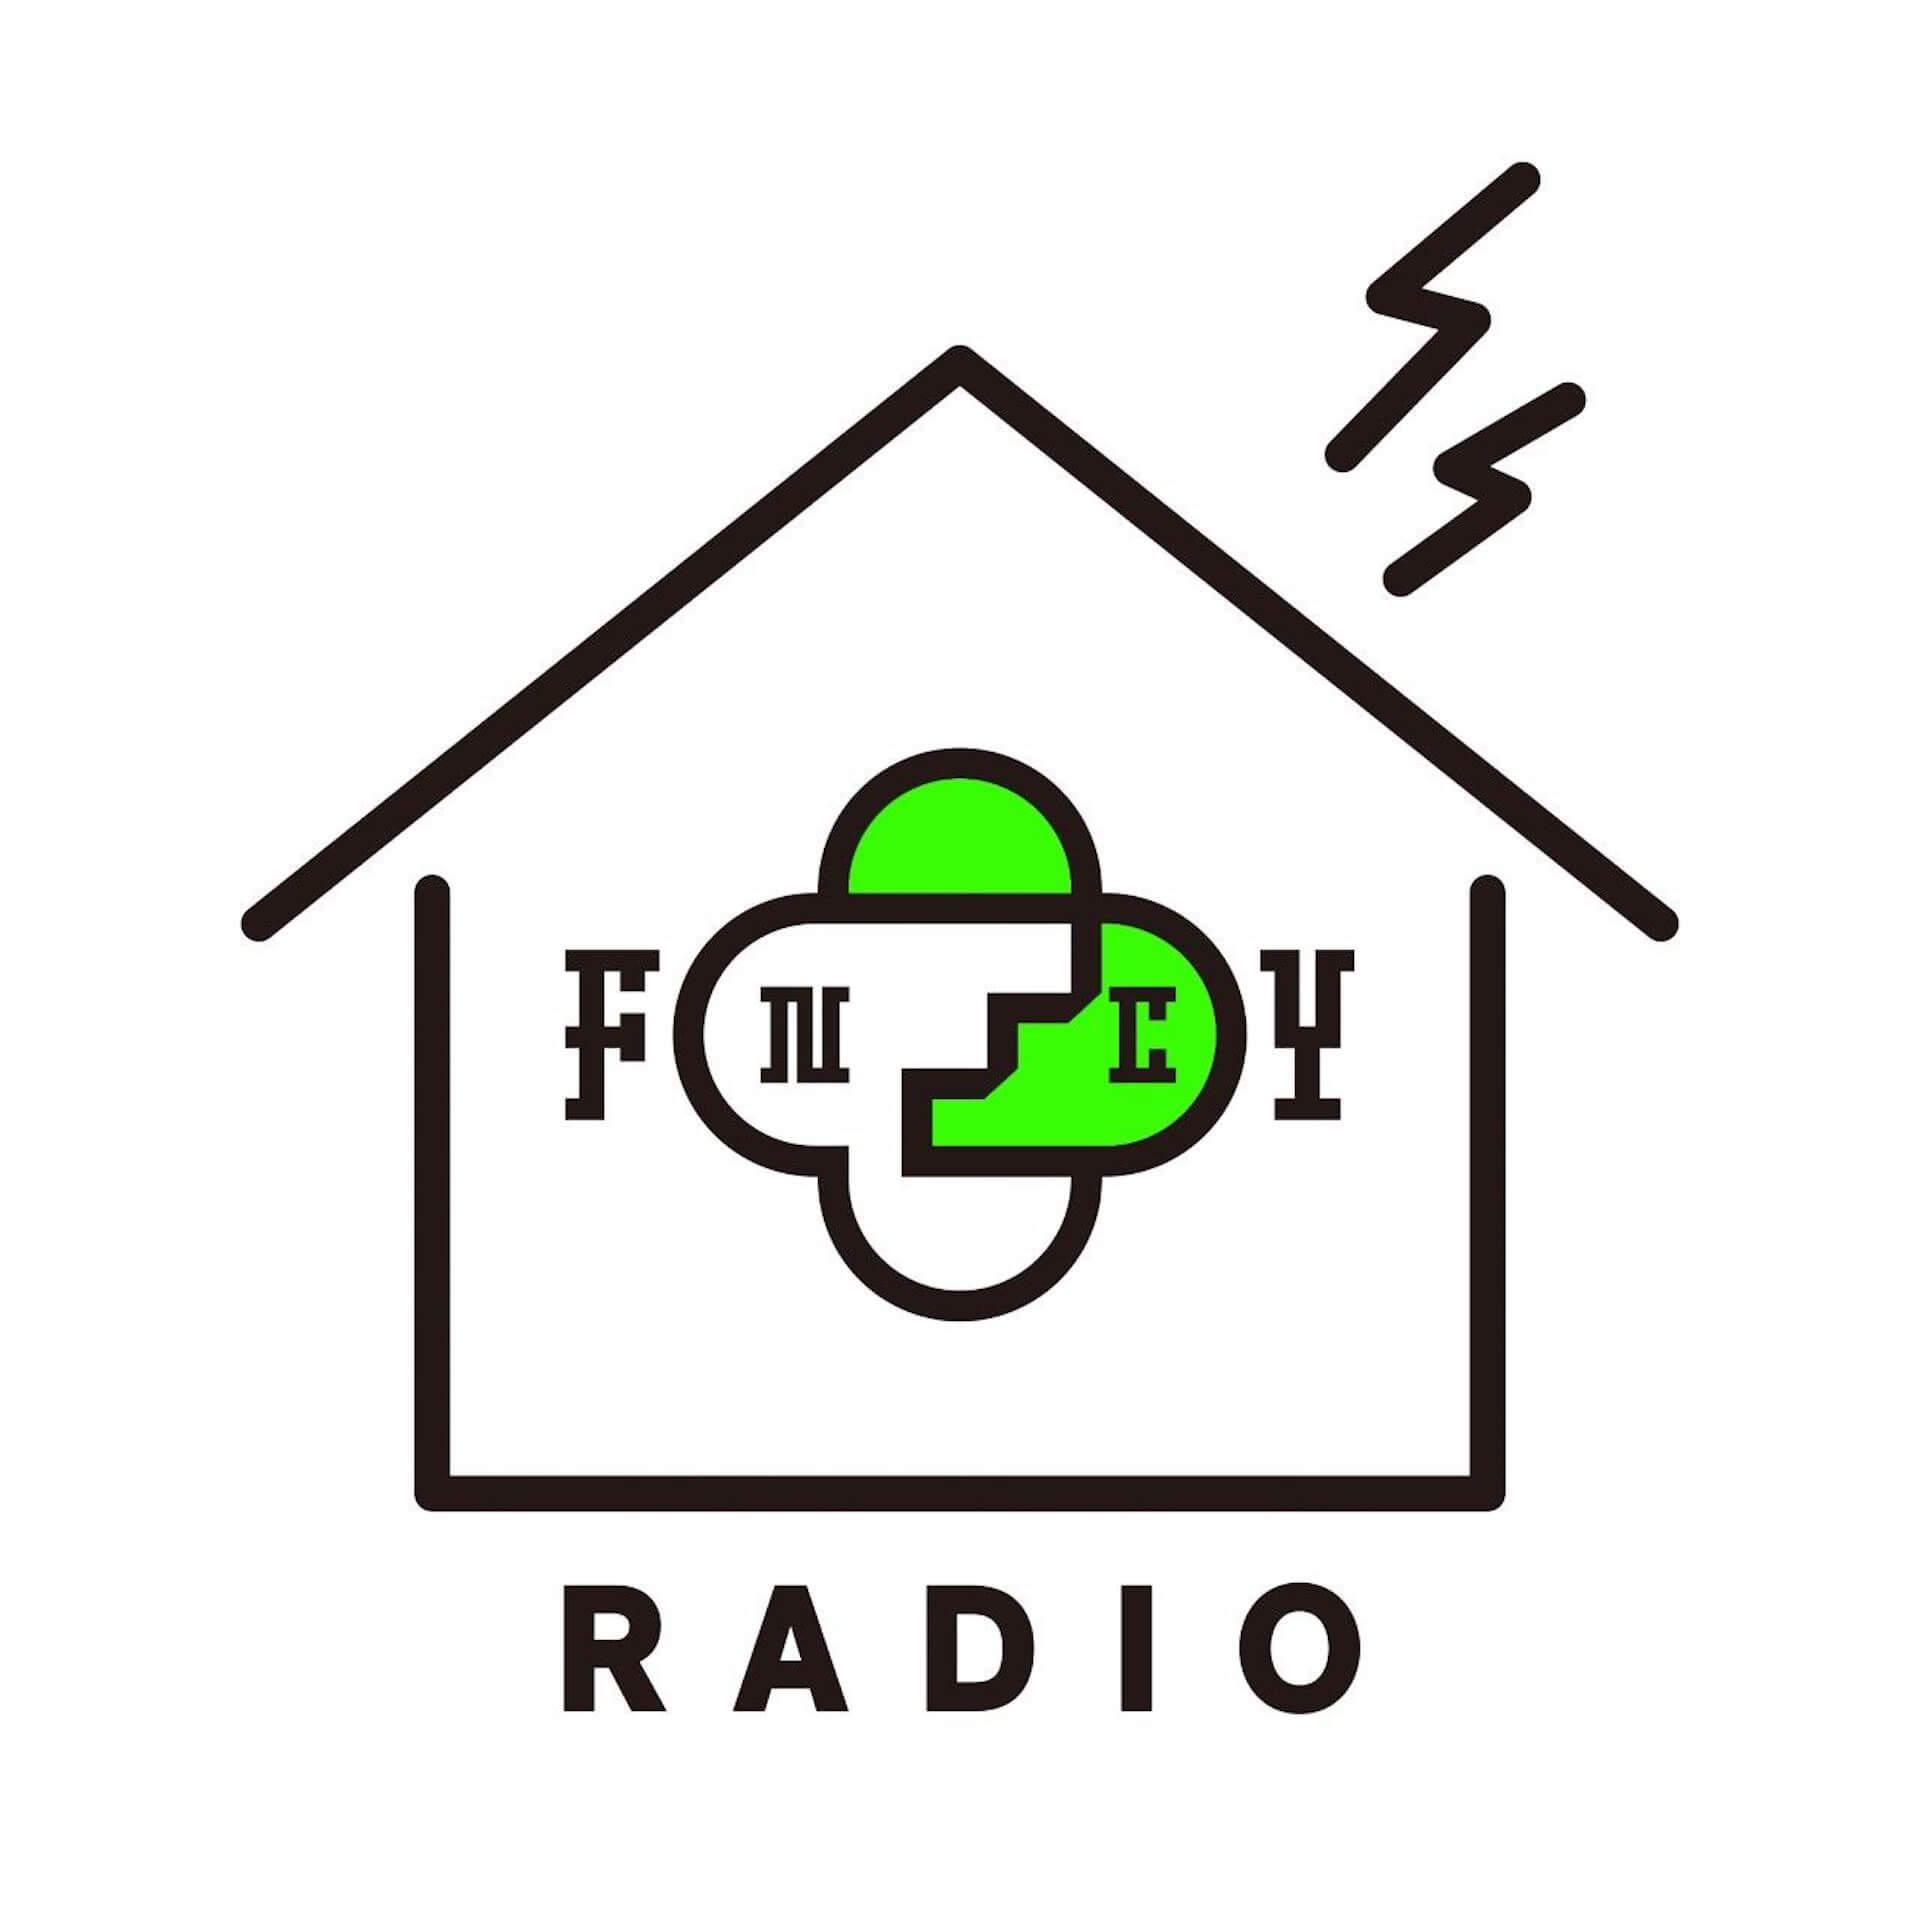 FNCYが1stEP『TOKYO LUV EP』をリリース!メンバー全員が在宅から出演するFNCY<HOME RADIO>の配信も決定 YouTube2160X2160